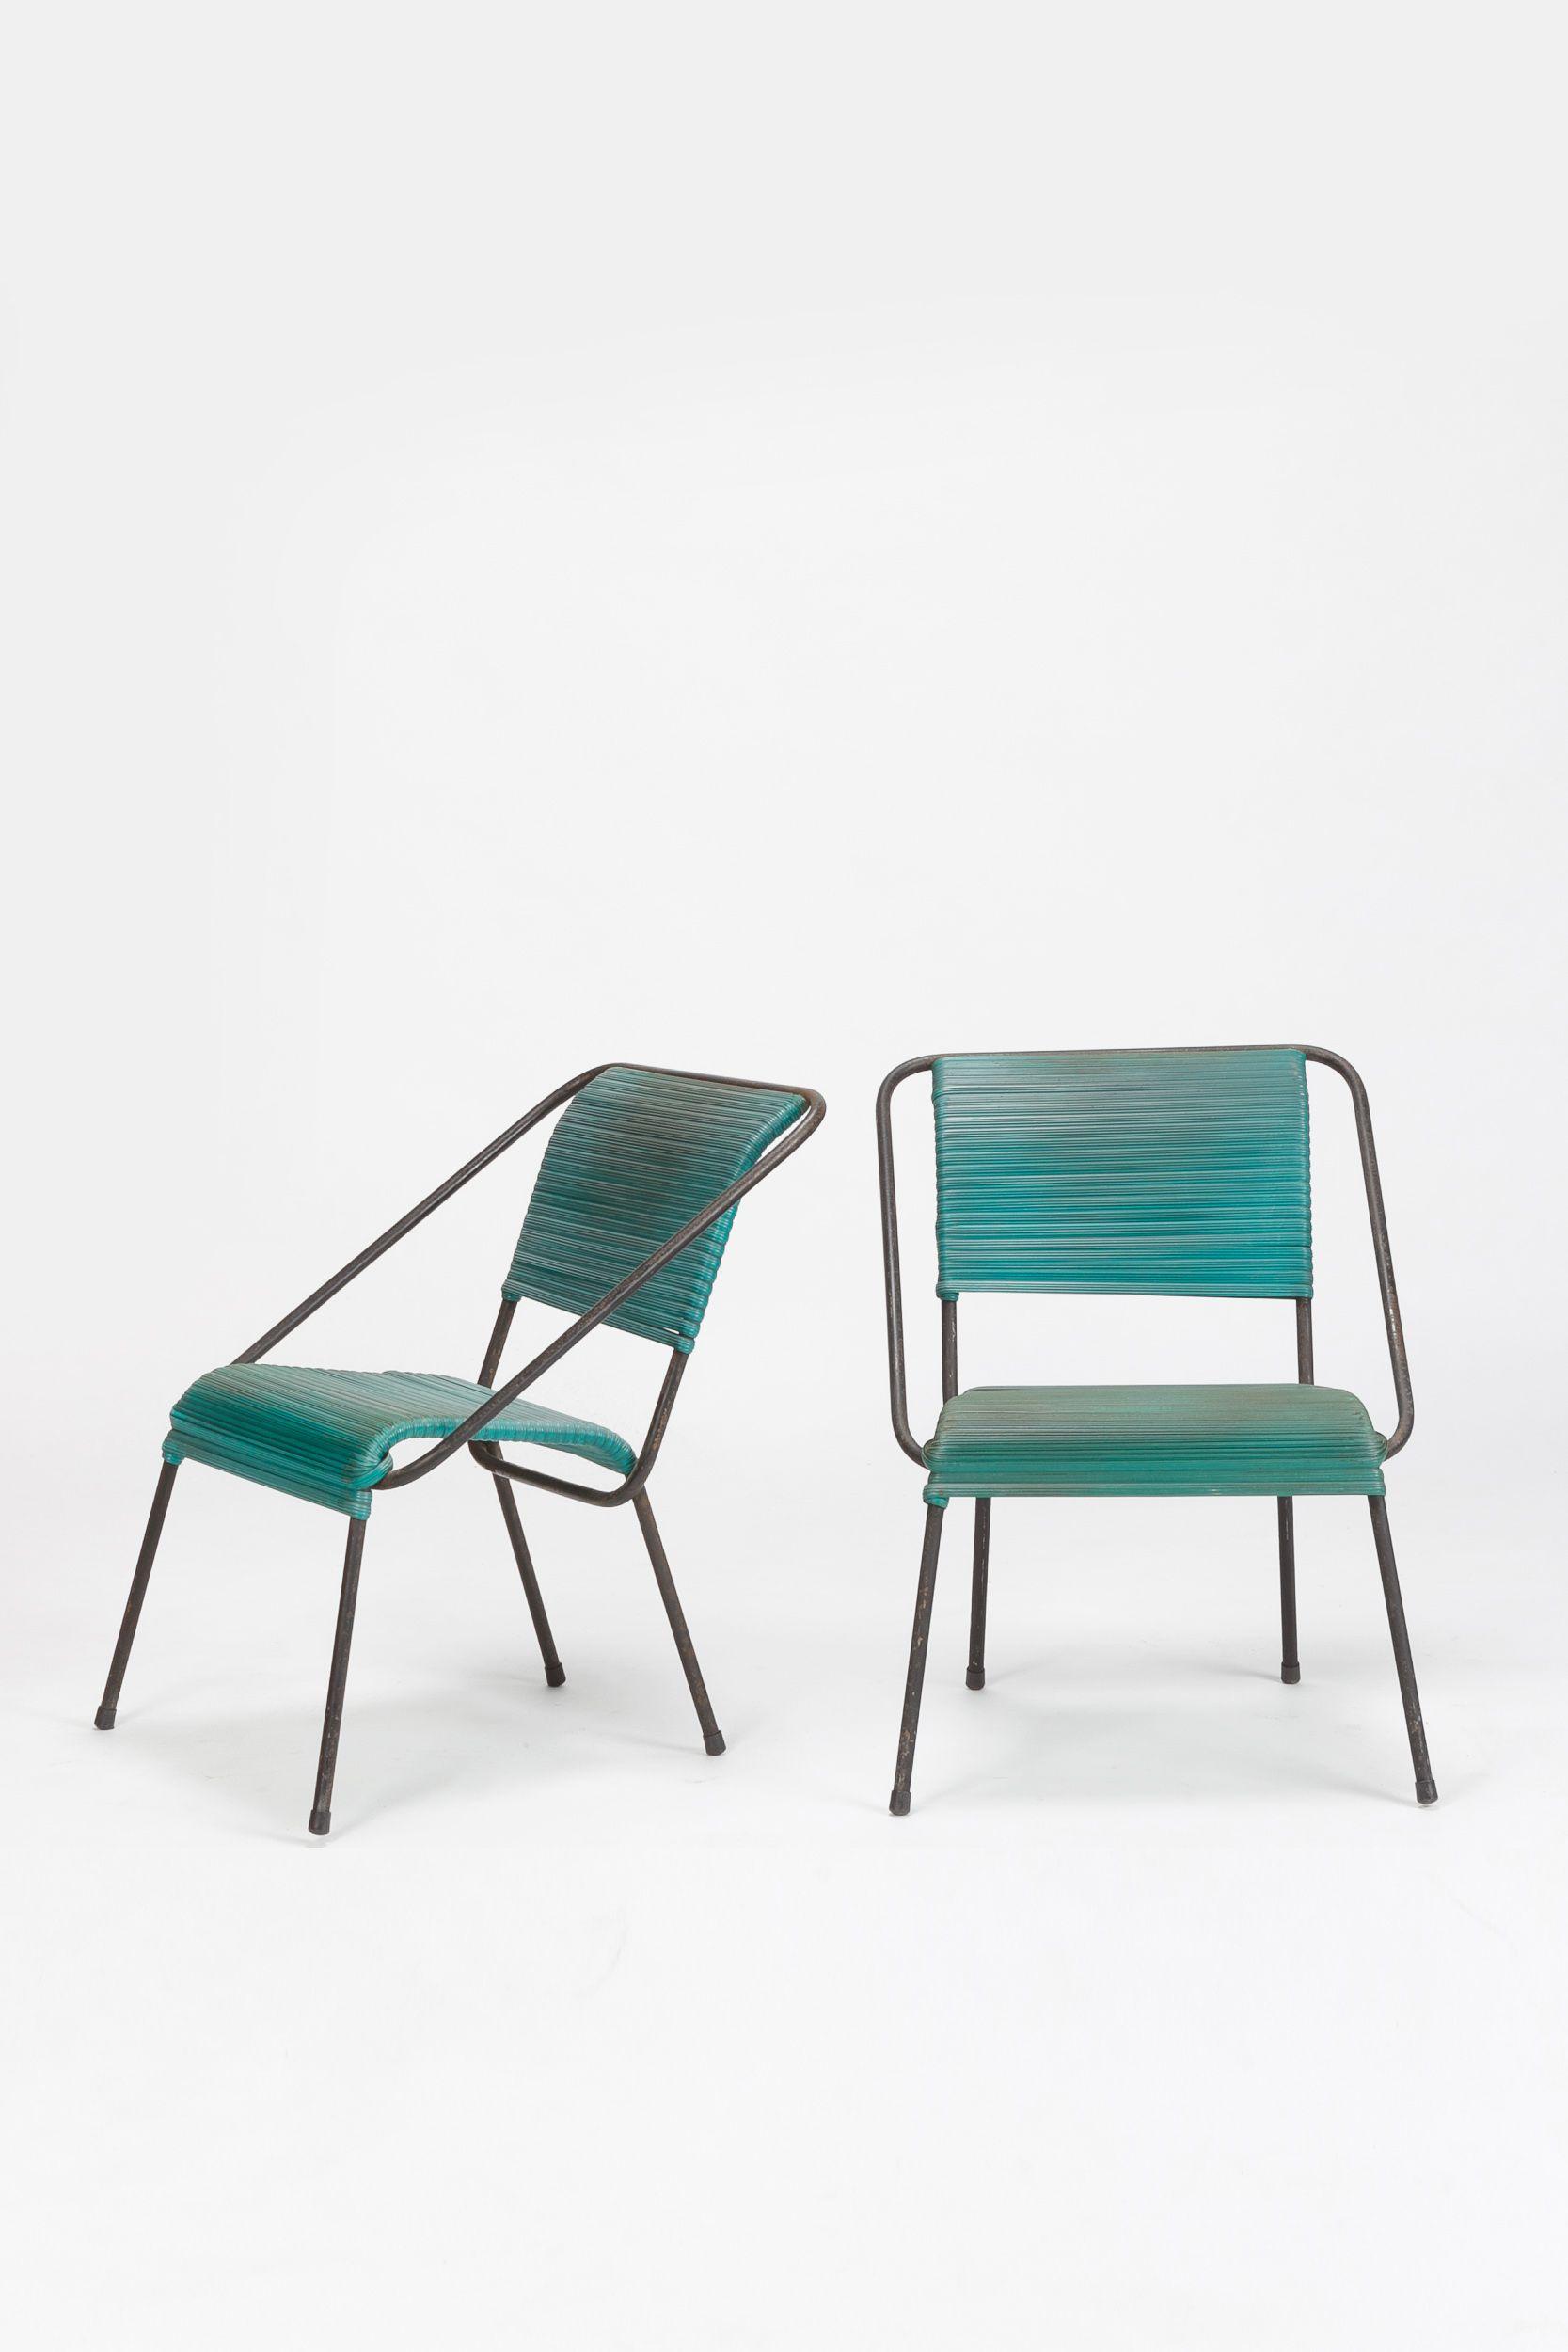 Pair Of Garden Chairs Attr Coen De Vries Furniture Pinterest  # Muebles Lema Rosario